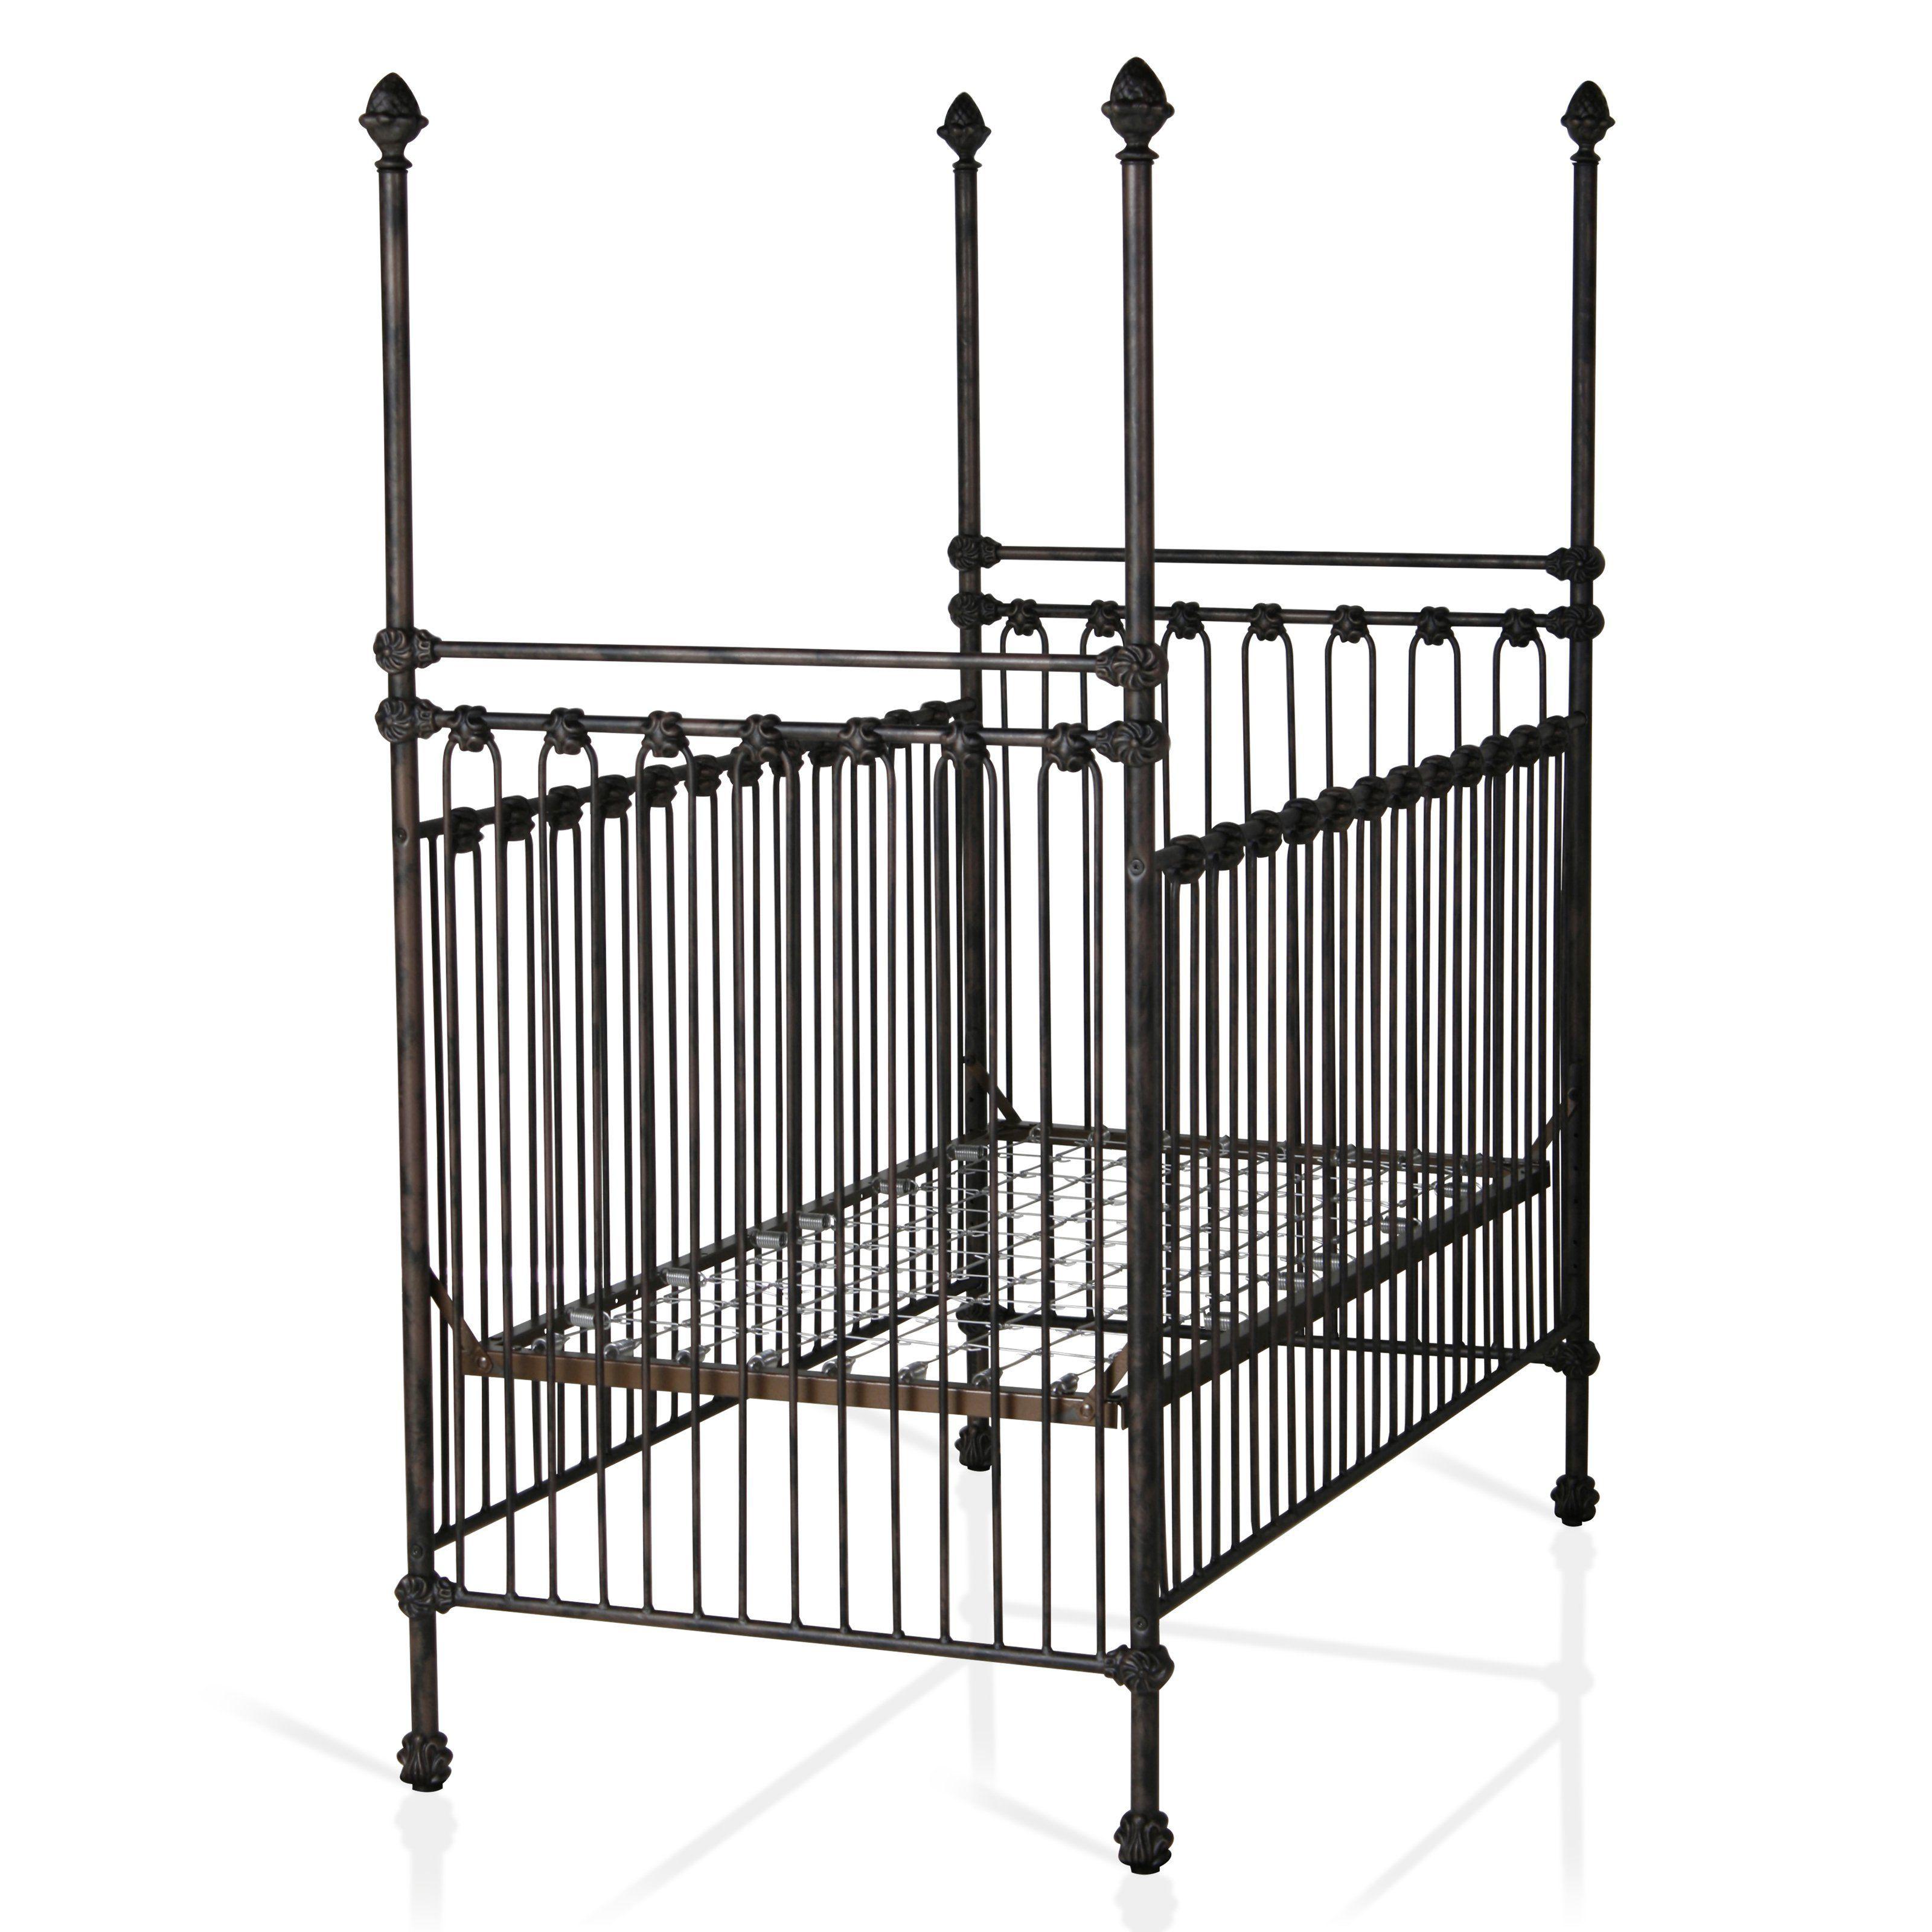 Crib for sale essex - Corsican 4 Poster Crib The Corsican 4 Poster Crib Will Give Your Nursery A Regal